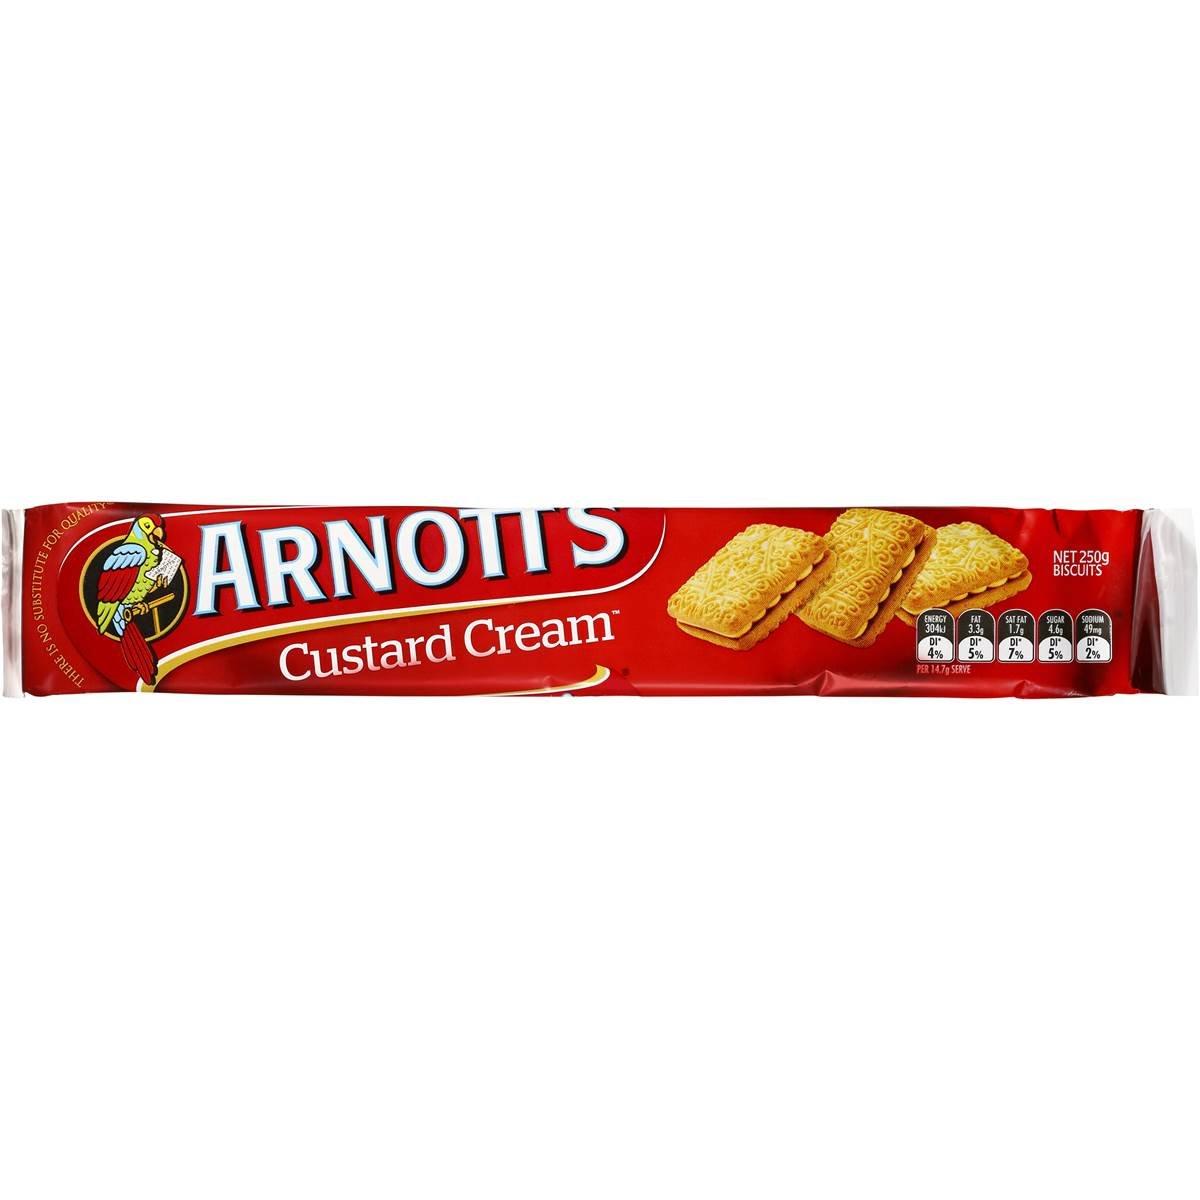 Arnotts Custard Cream Biscuits 250g (Australian Made)